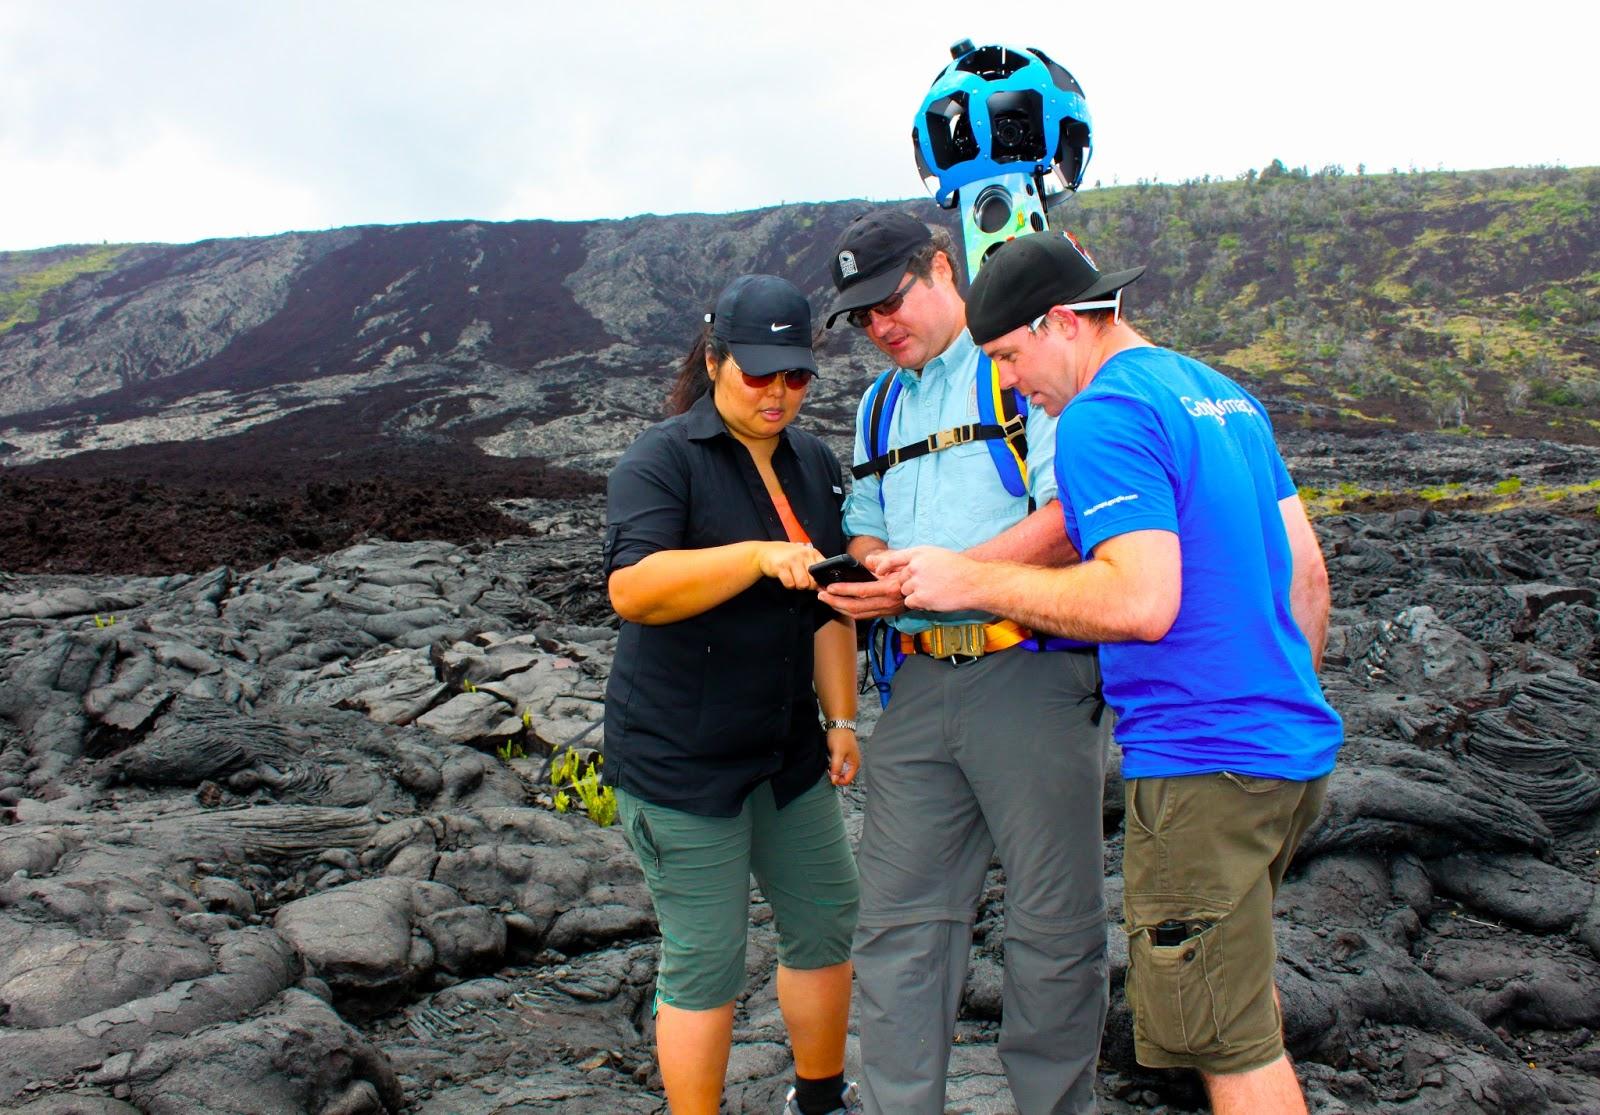 Google Lat Long Apply Now To Be The Next Google Maps Trekker - Google maps trails